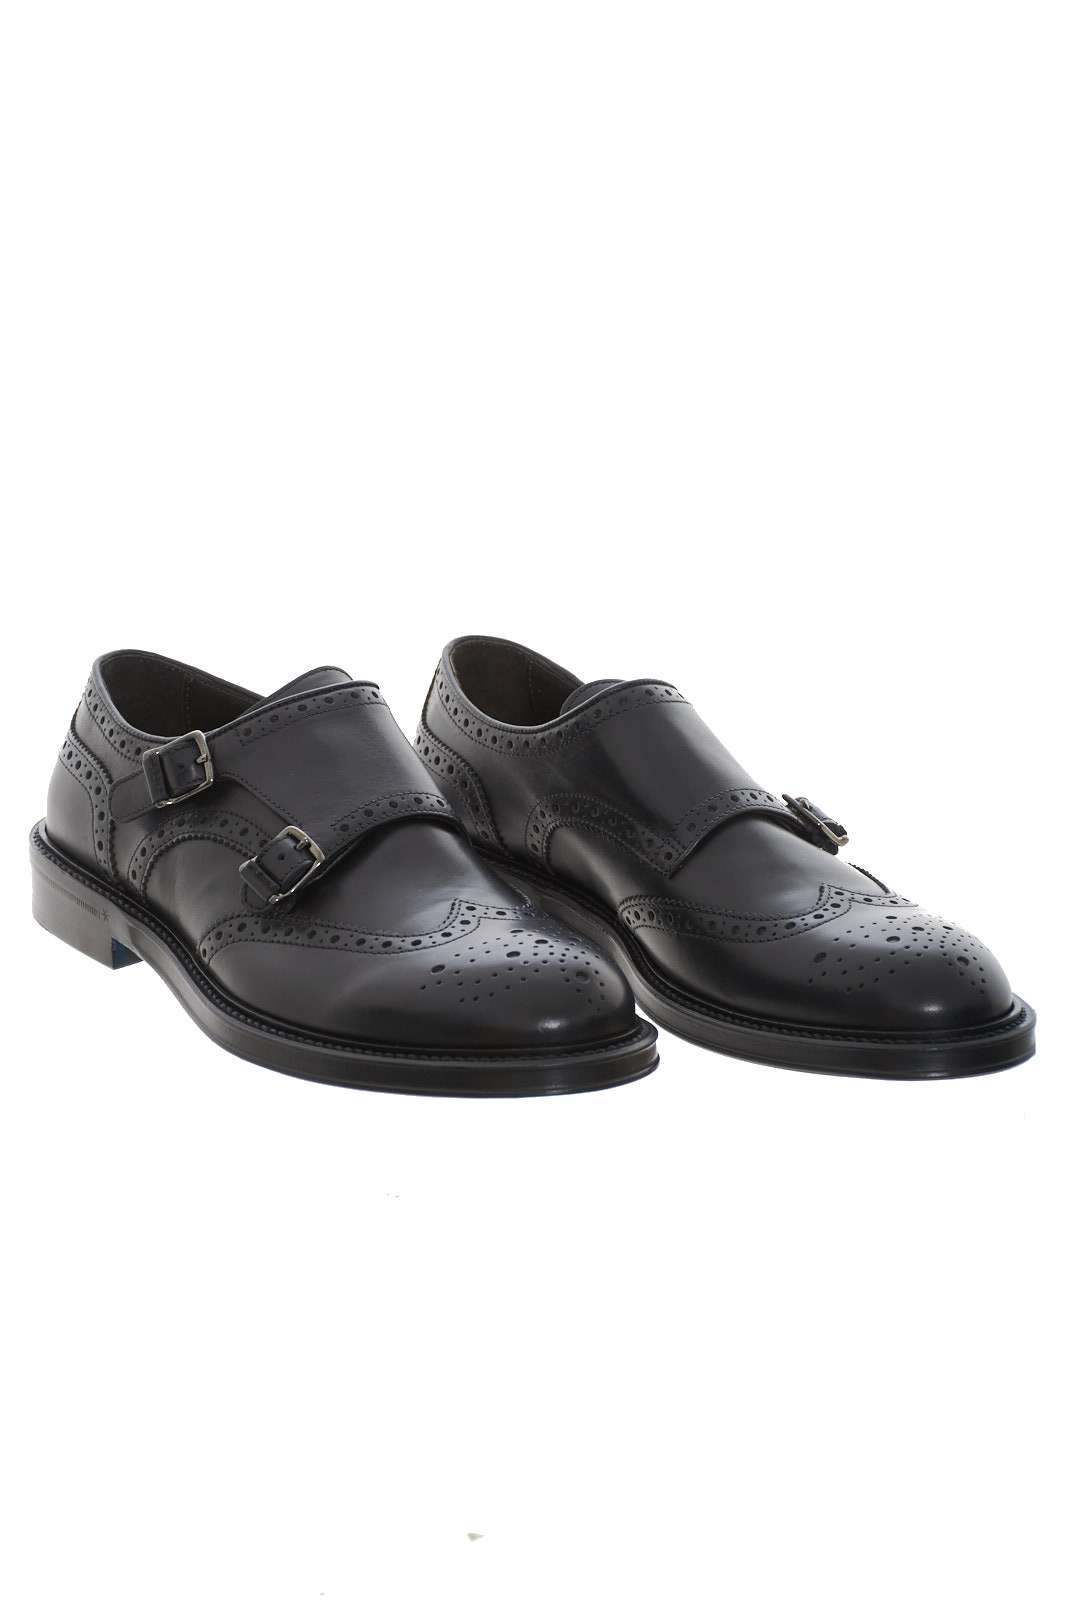 AI-outlet_parmax-scarpe-uomo-Corvari-8577-